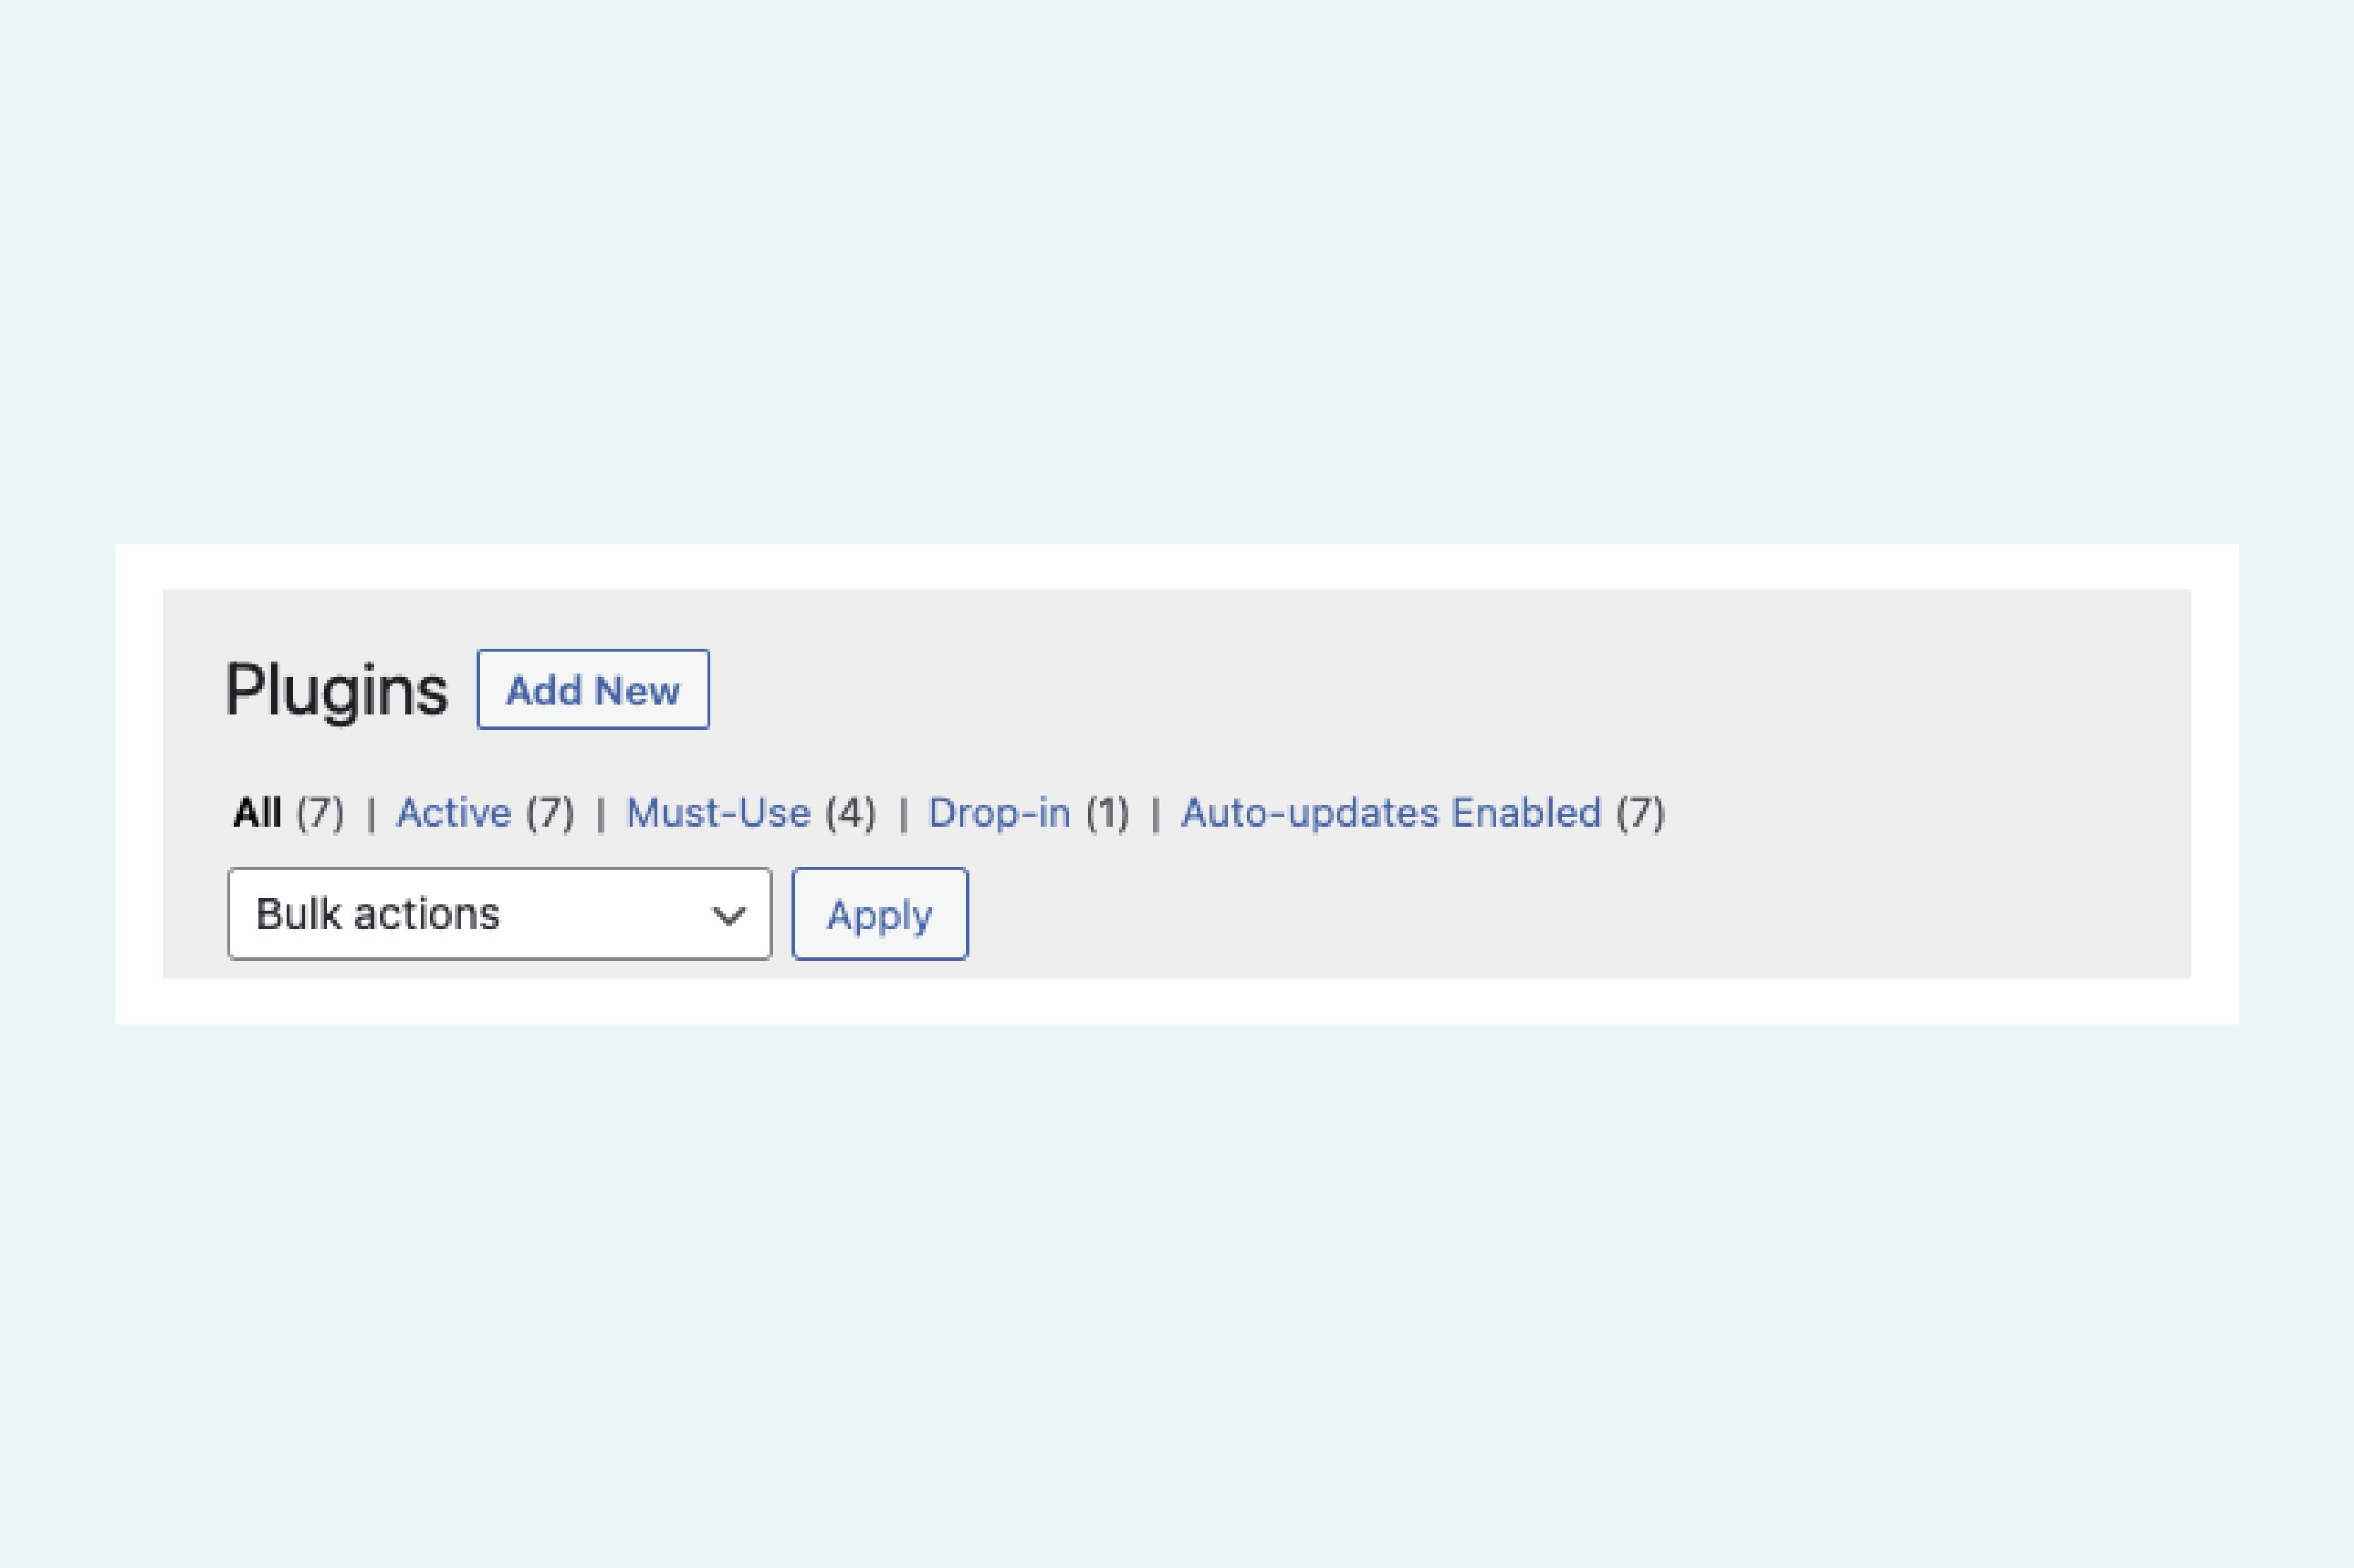 screenshot of the wordpress plugin update page options